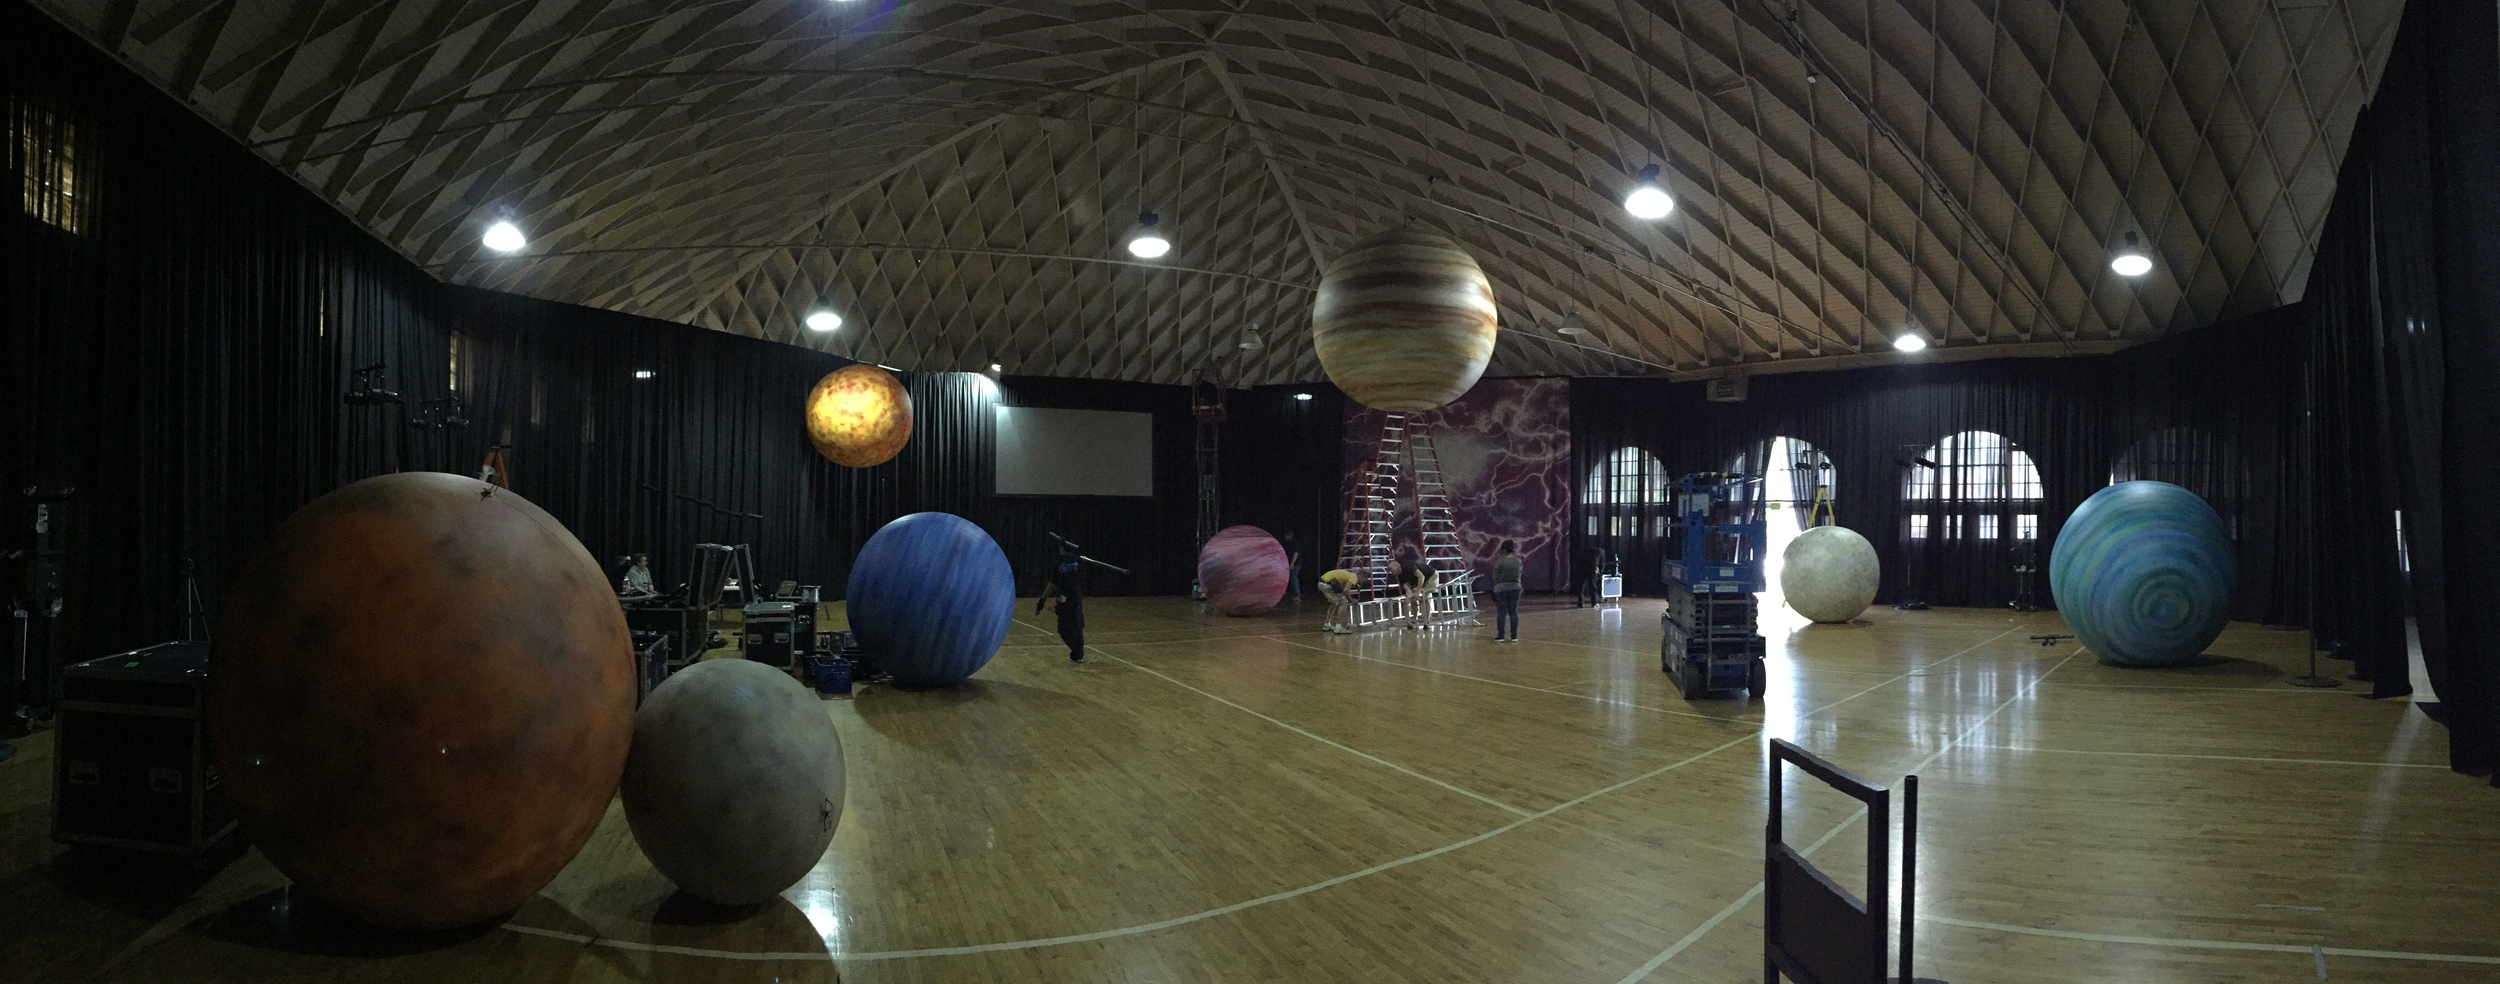 Planets by Matthew McAvene Santa Barbara Museum of Natural History 100 year Anniversary Party Set up 1.JPG